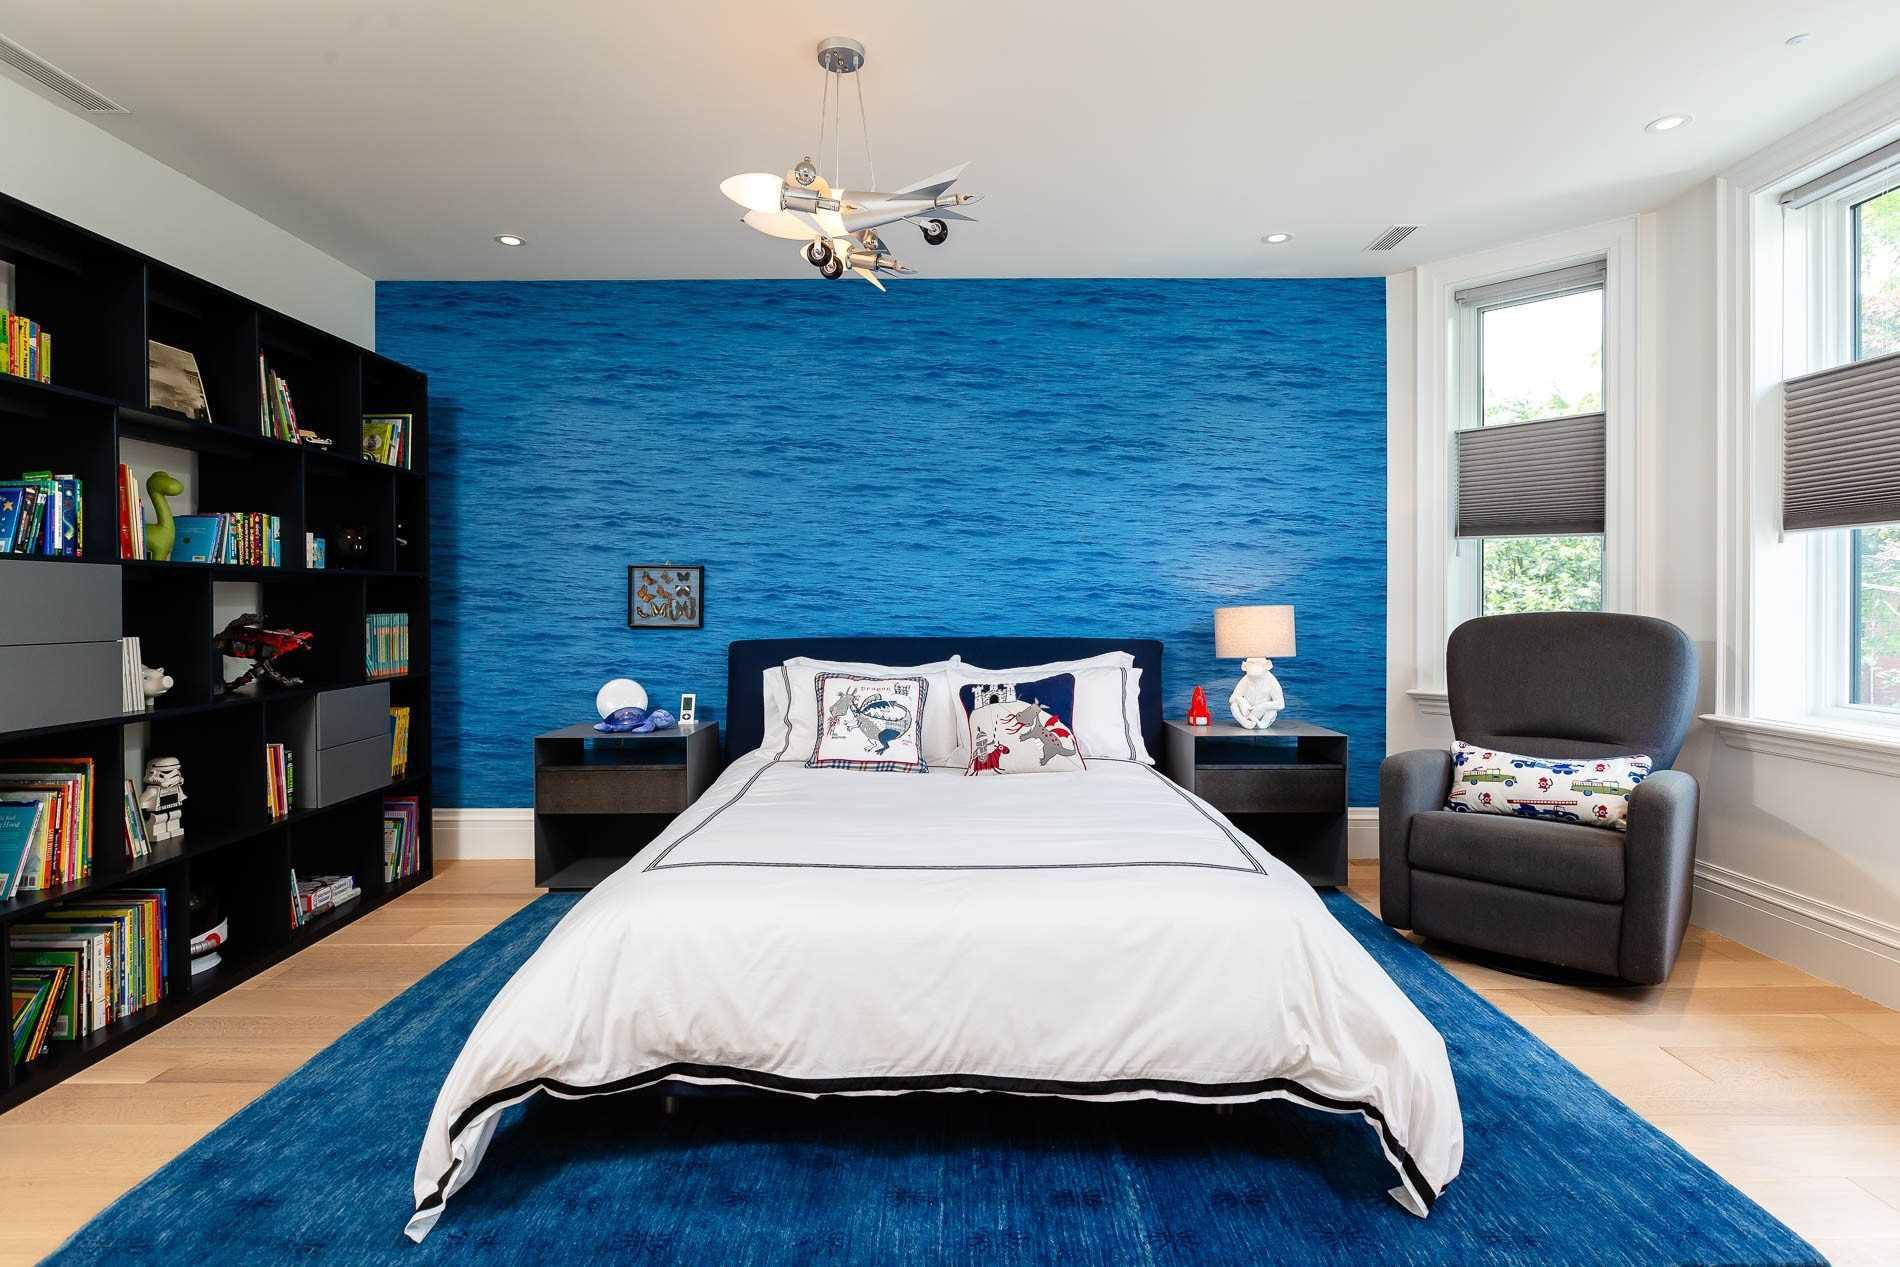 Photo 15: Photos: 45 Admiral Road in Toronto: Annex House (3-Storey) for sale (Toronto C02)  : MLS®# C4612730